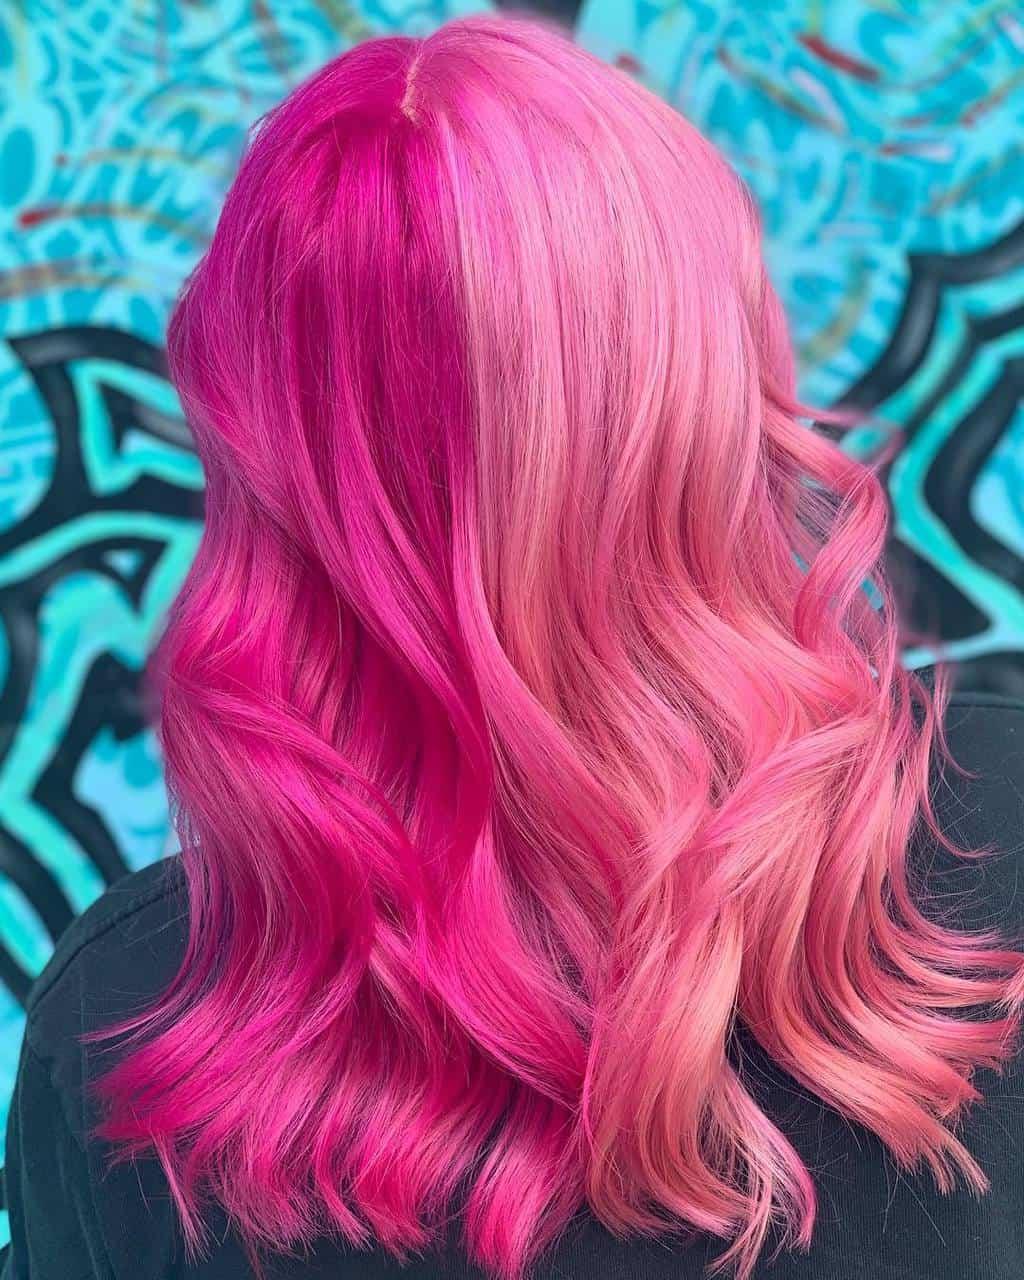 Split hair rosa